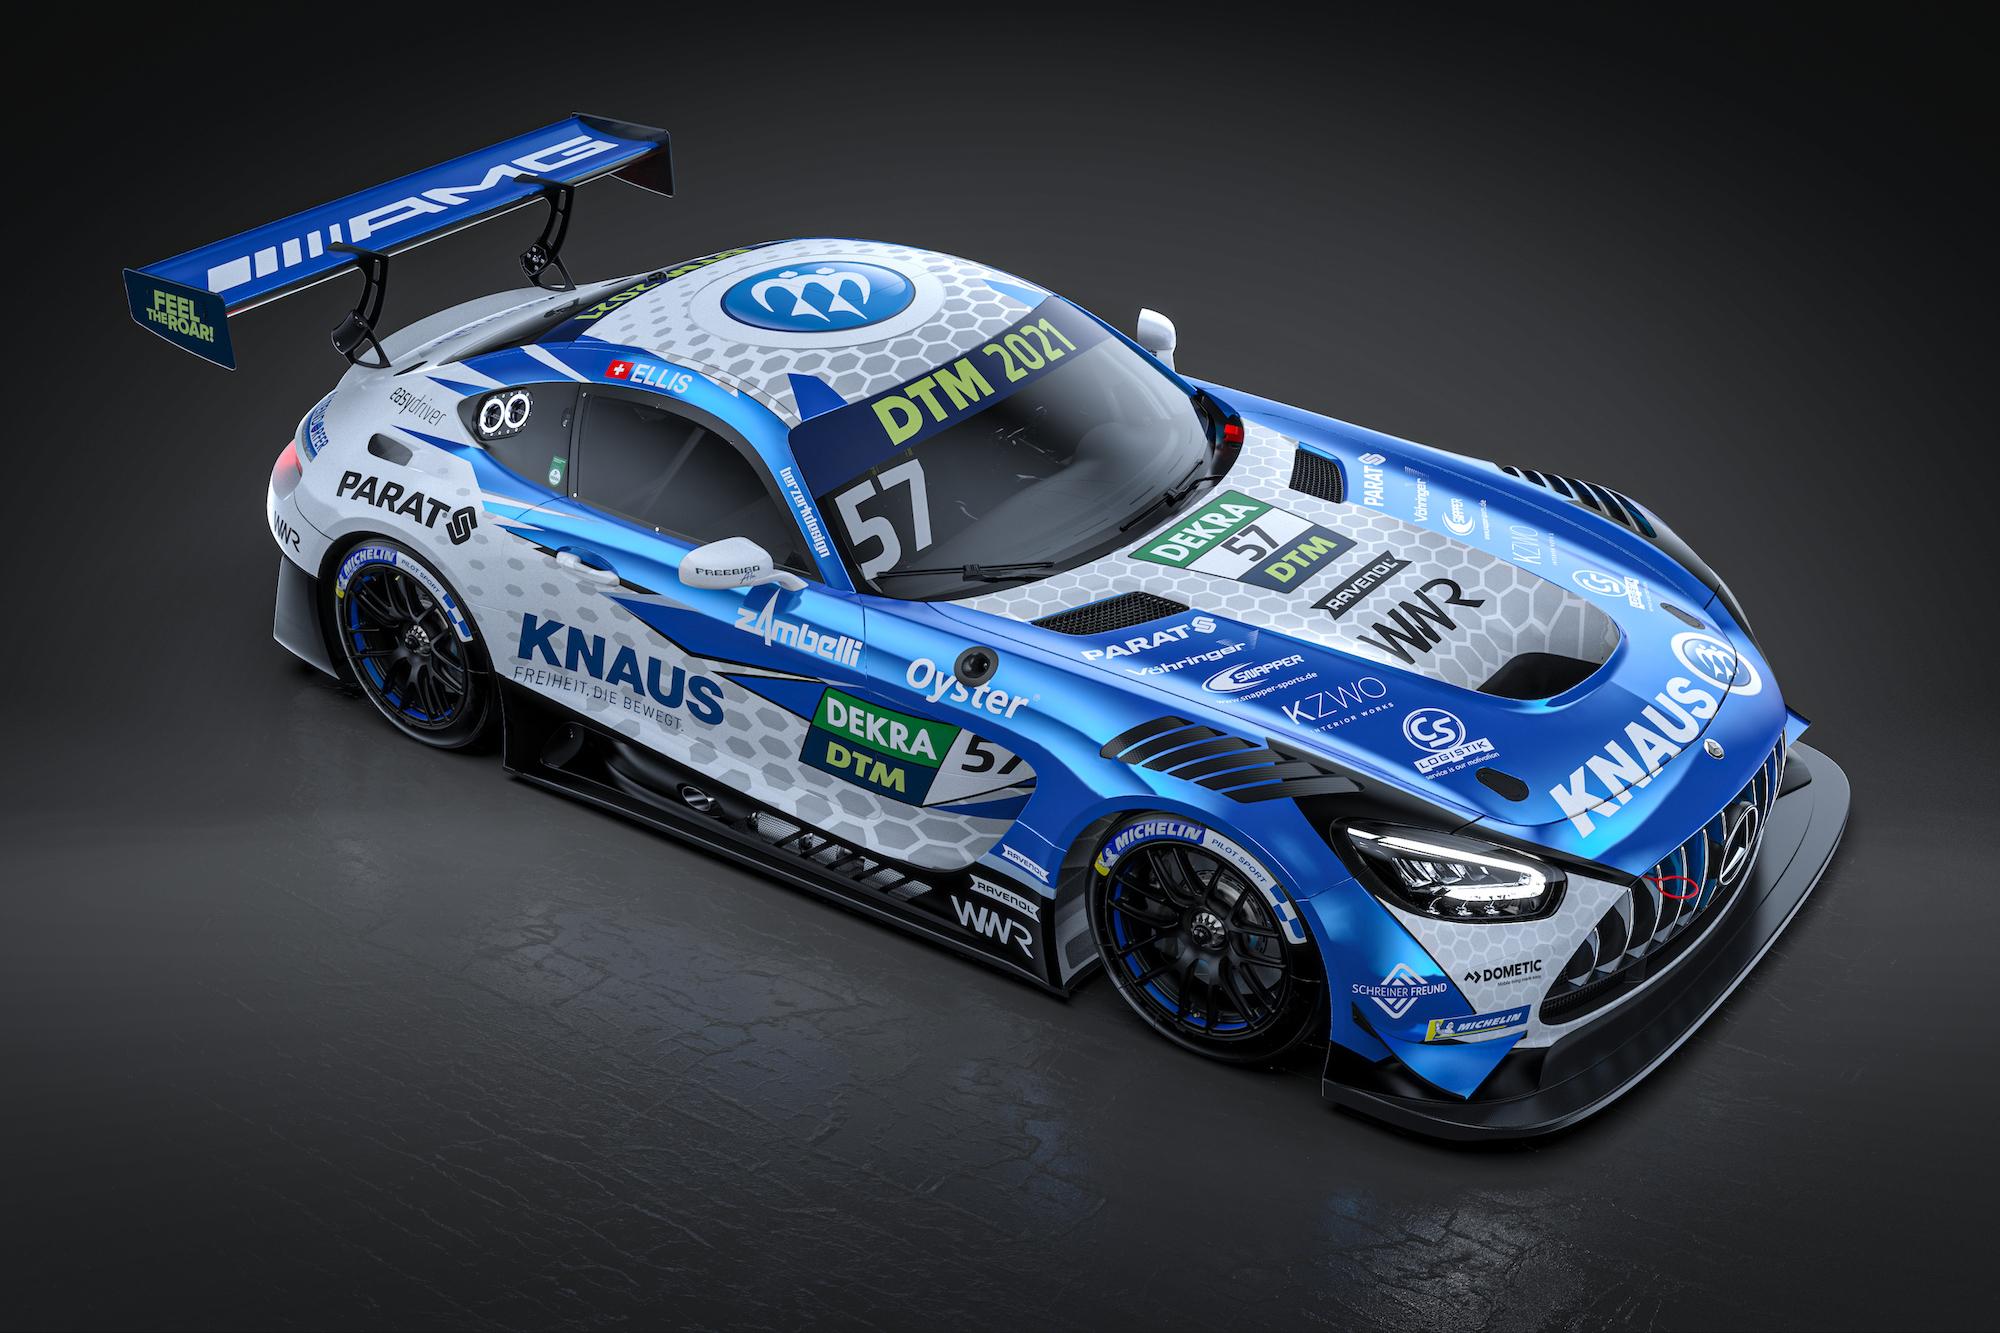 Mercedes-AMG pre-season preparations in full swing for DTM racing